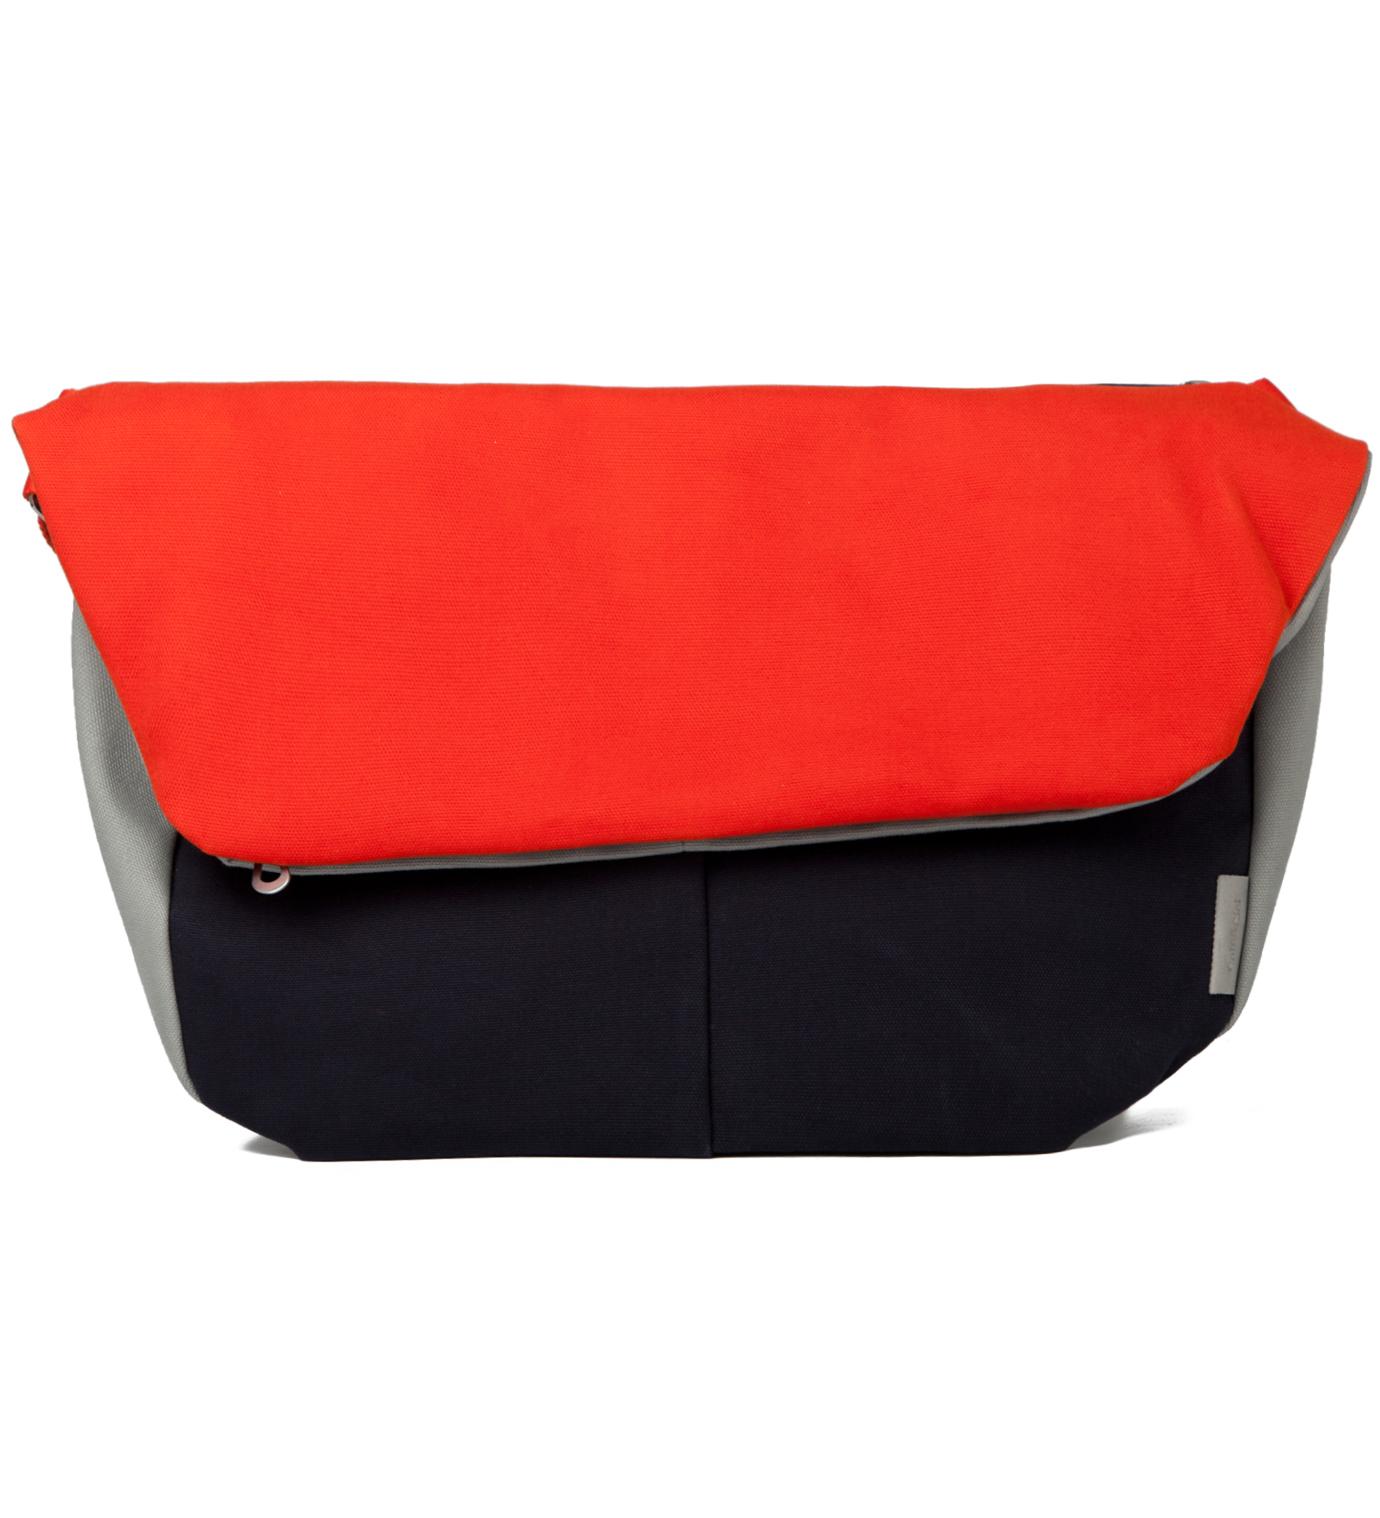 Côte&Ciel Côte&Ciel x Beams Orange Spree Messenger Bag